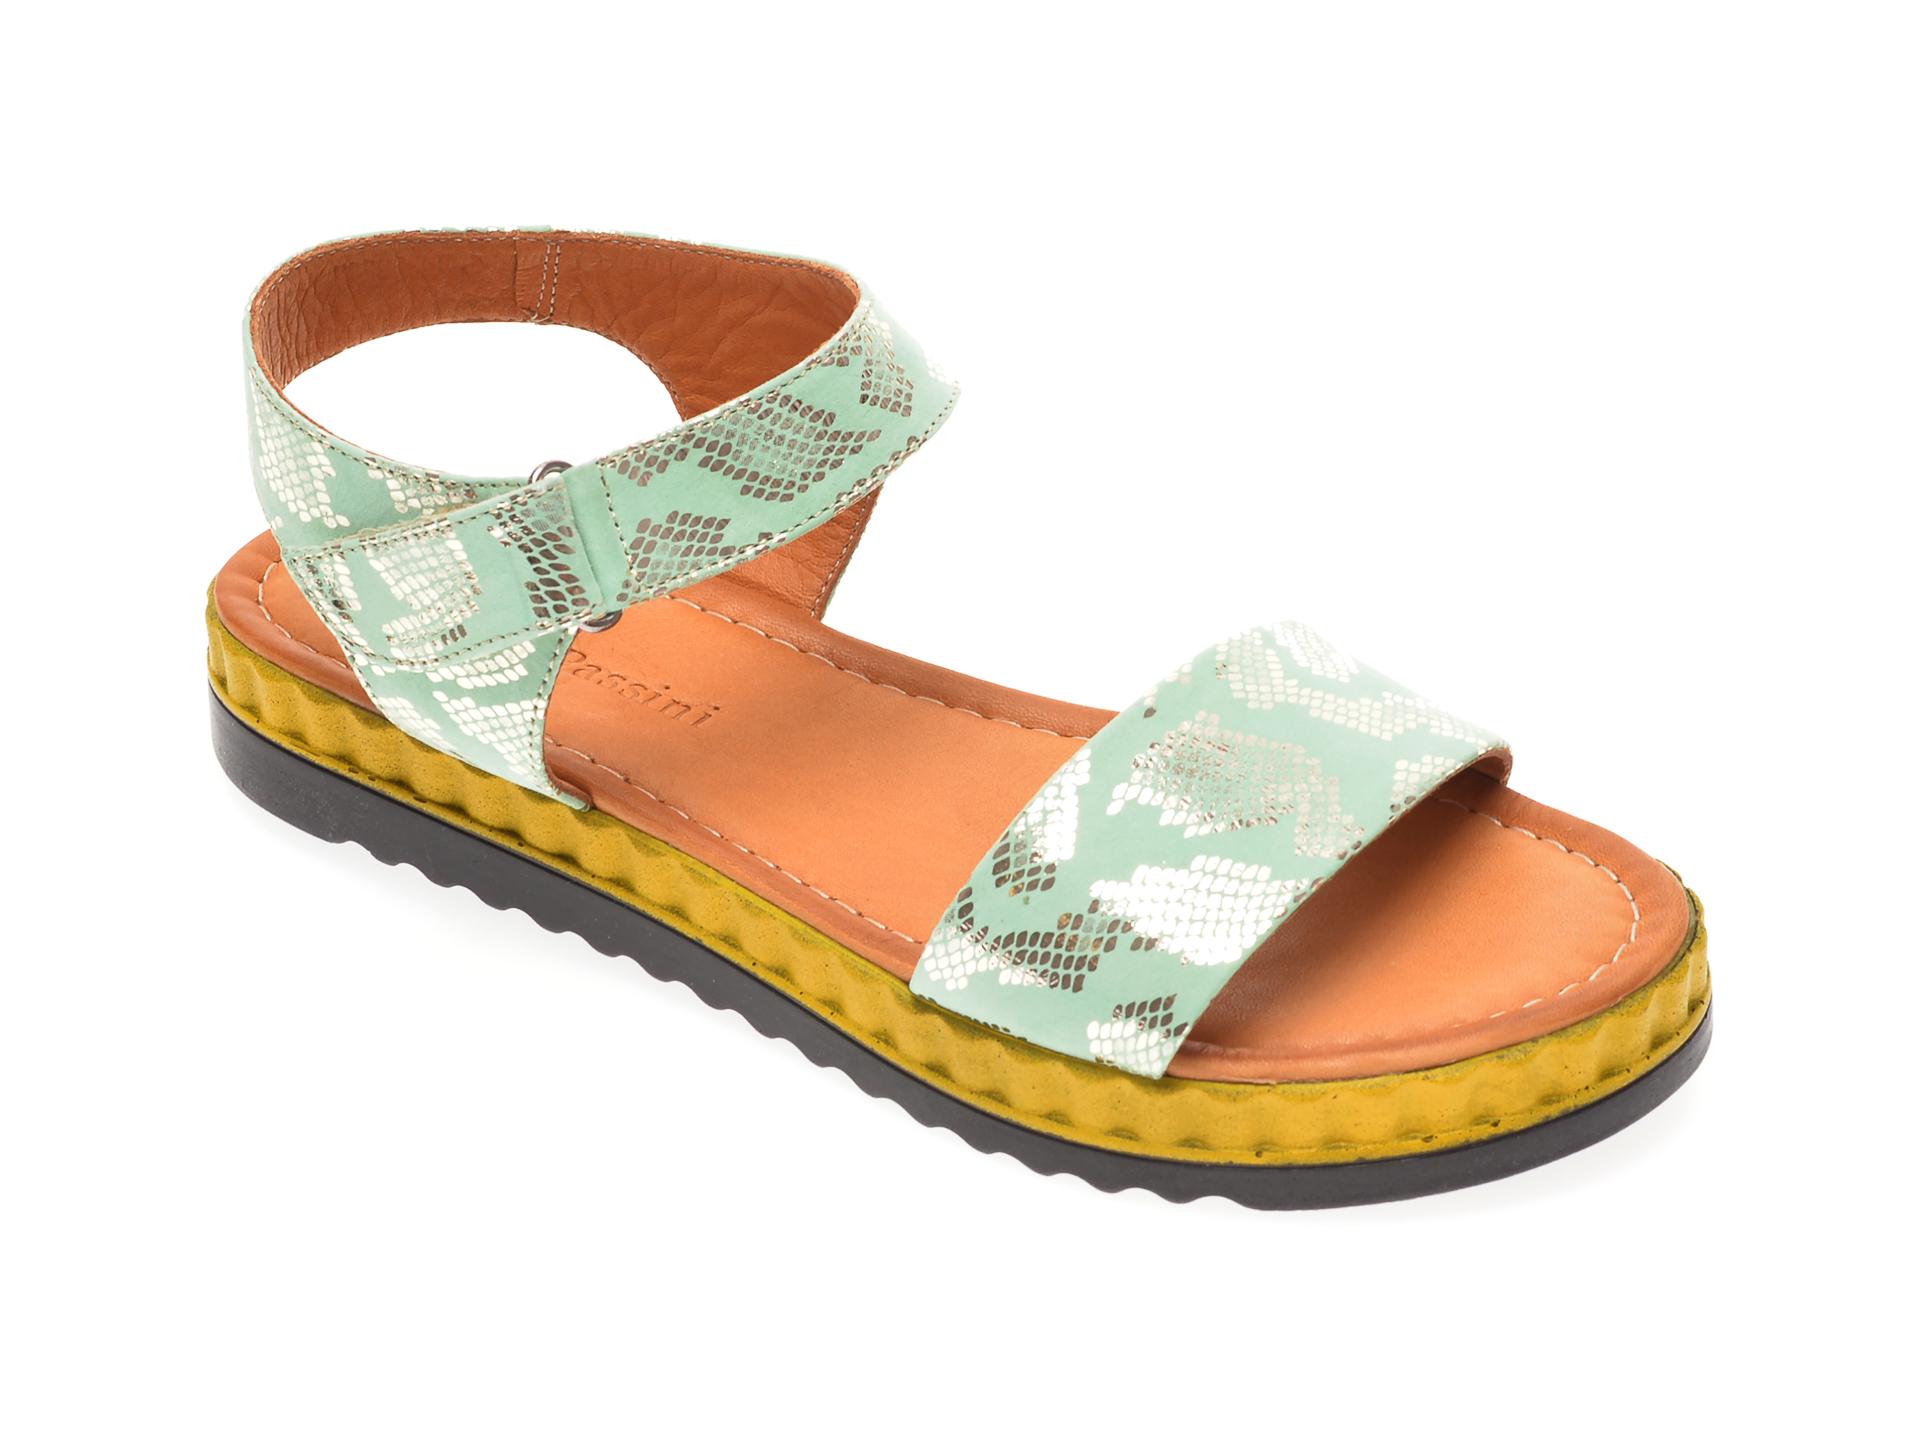 Sandale FLAVIA PASSINI verzi, 1182116, din piele naturala